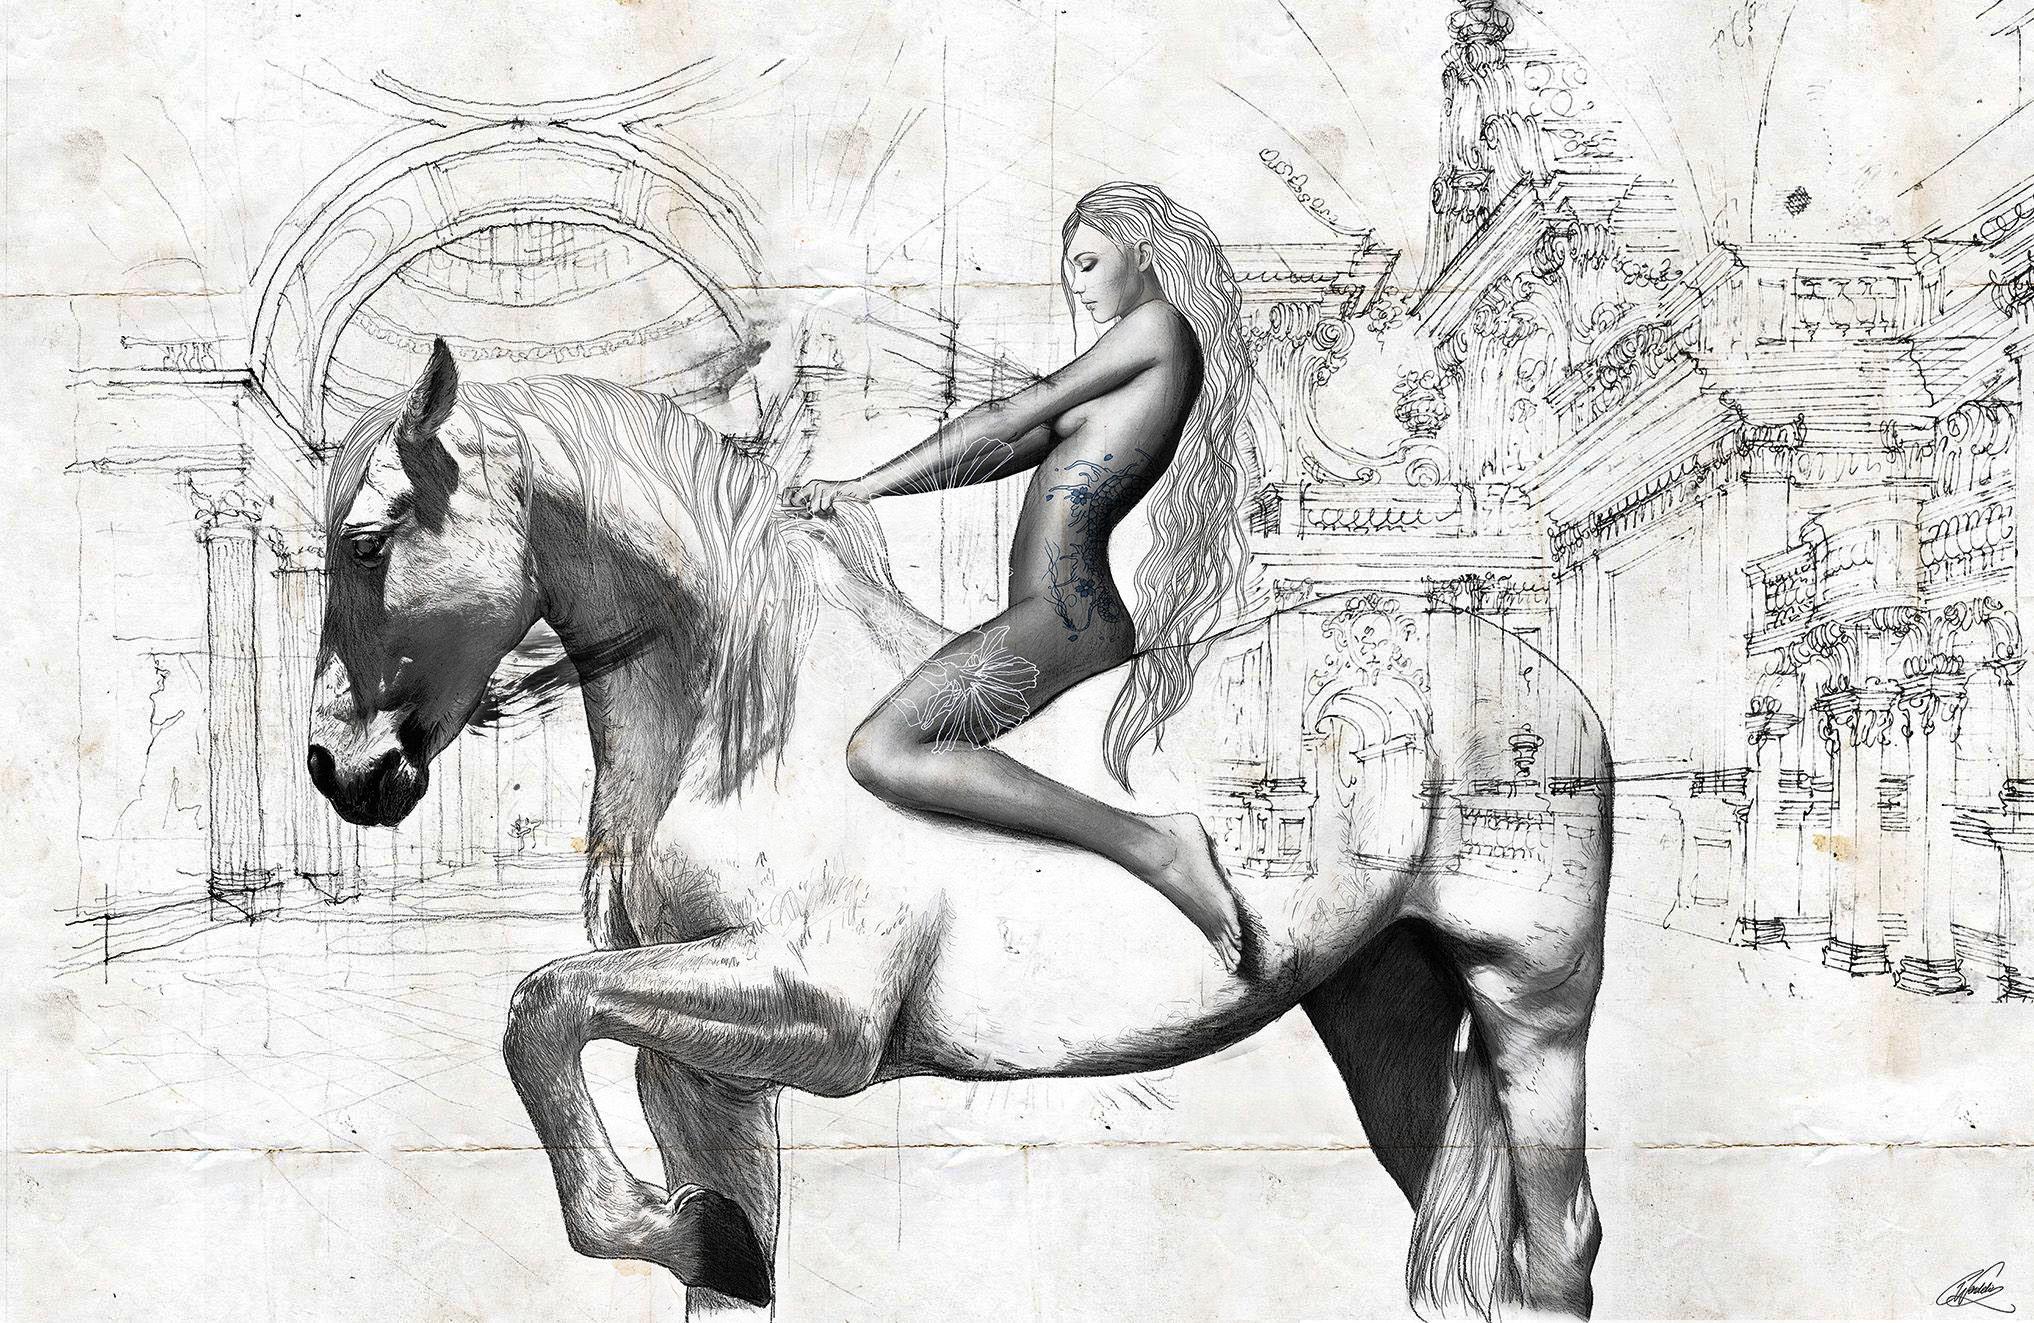 artwork_amazona_by_caroline_wendelin.jpg